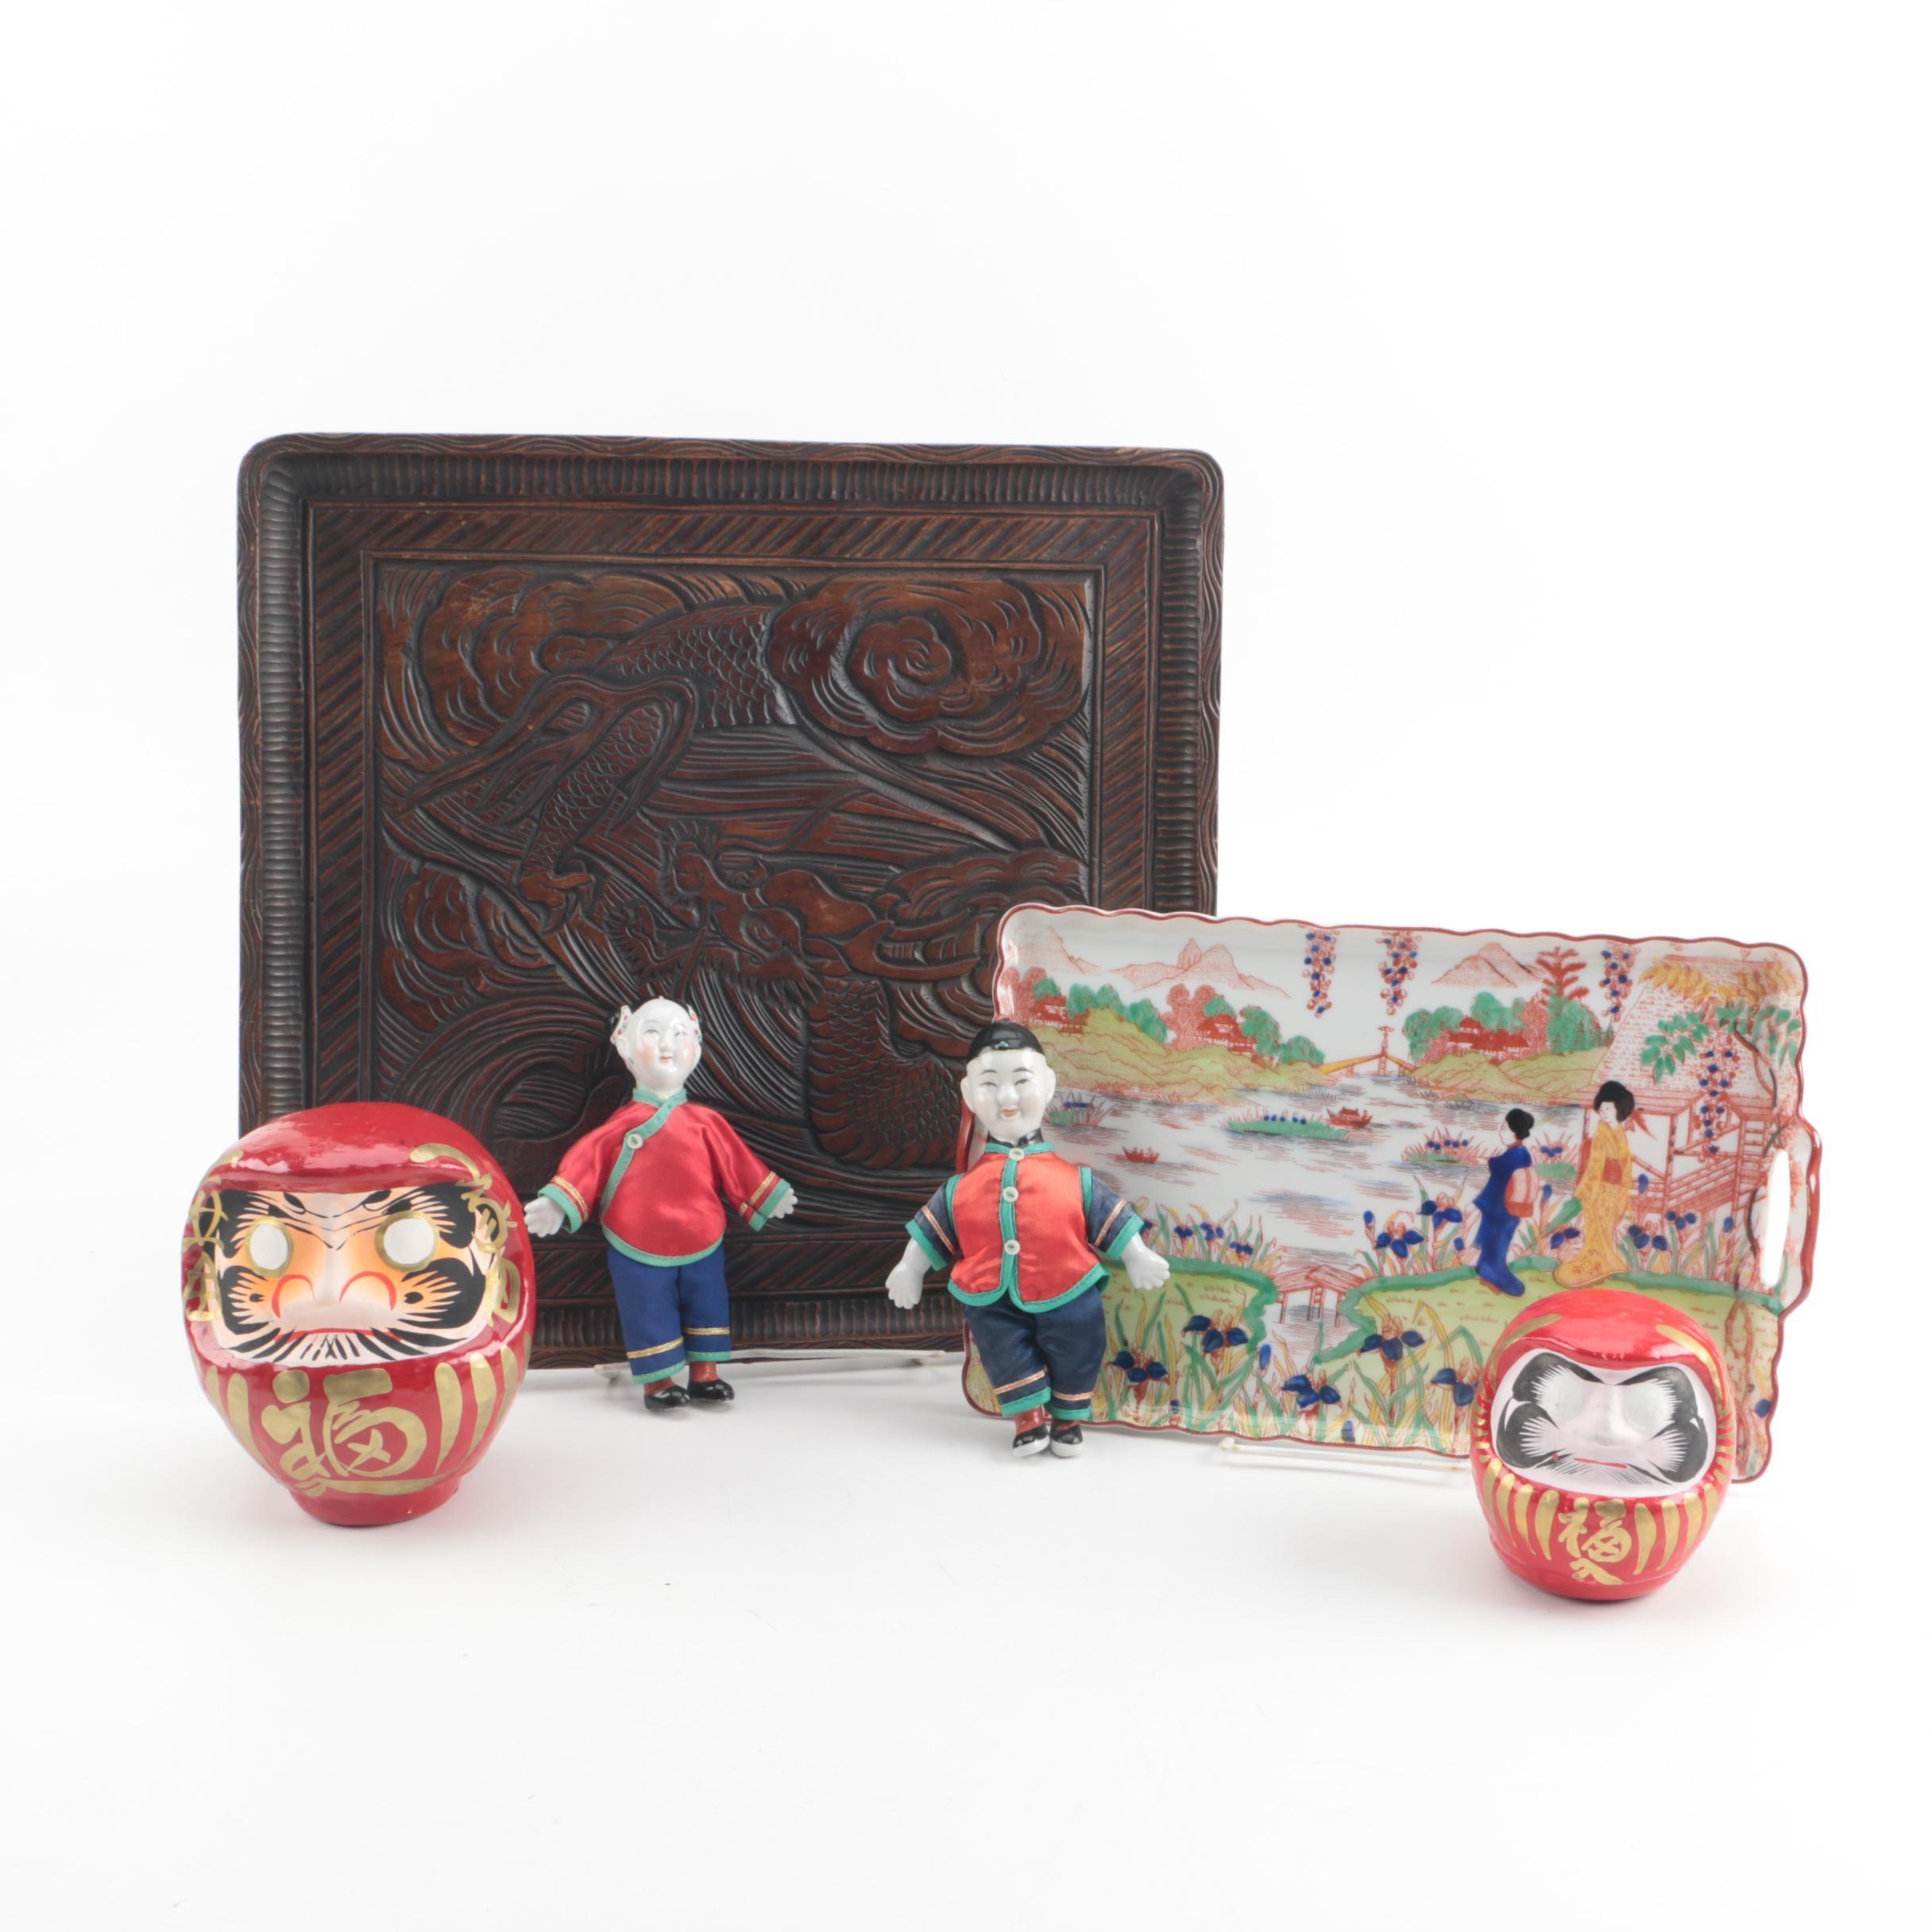 East Asian Trays and Dolls including Japanese Daruma Dolls